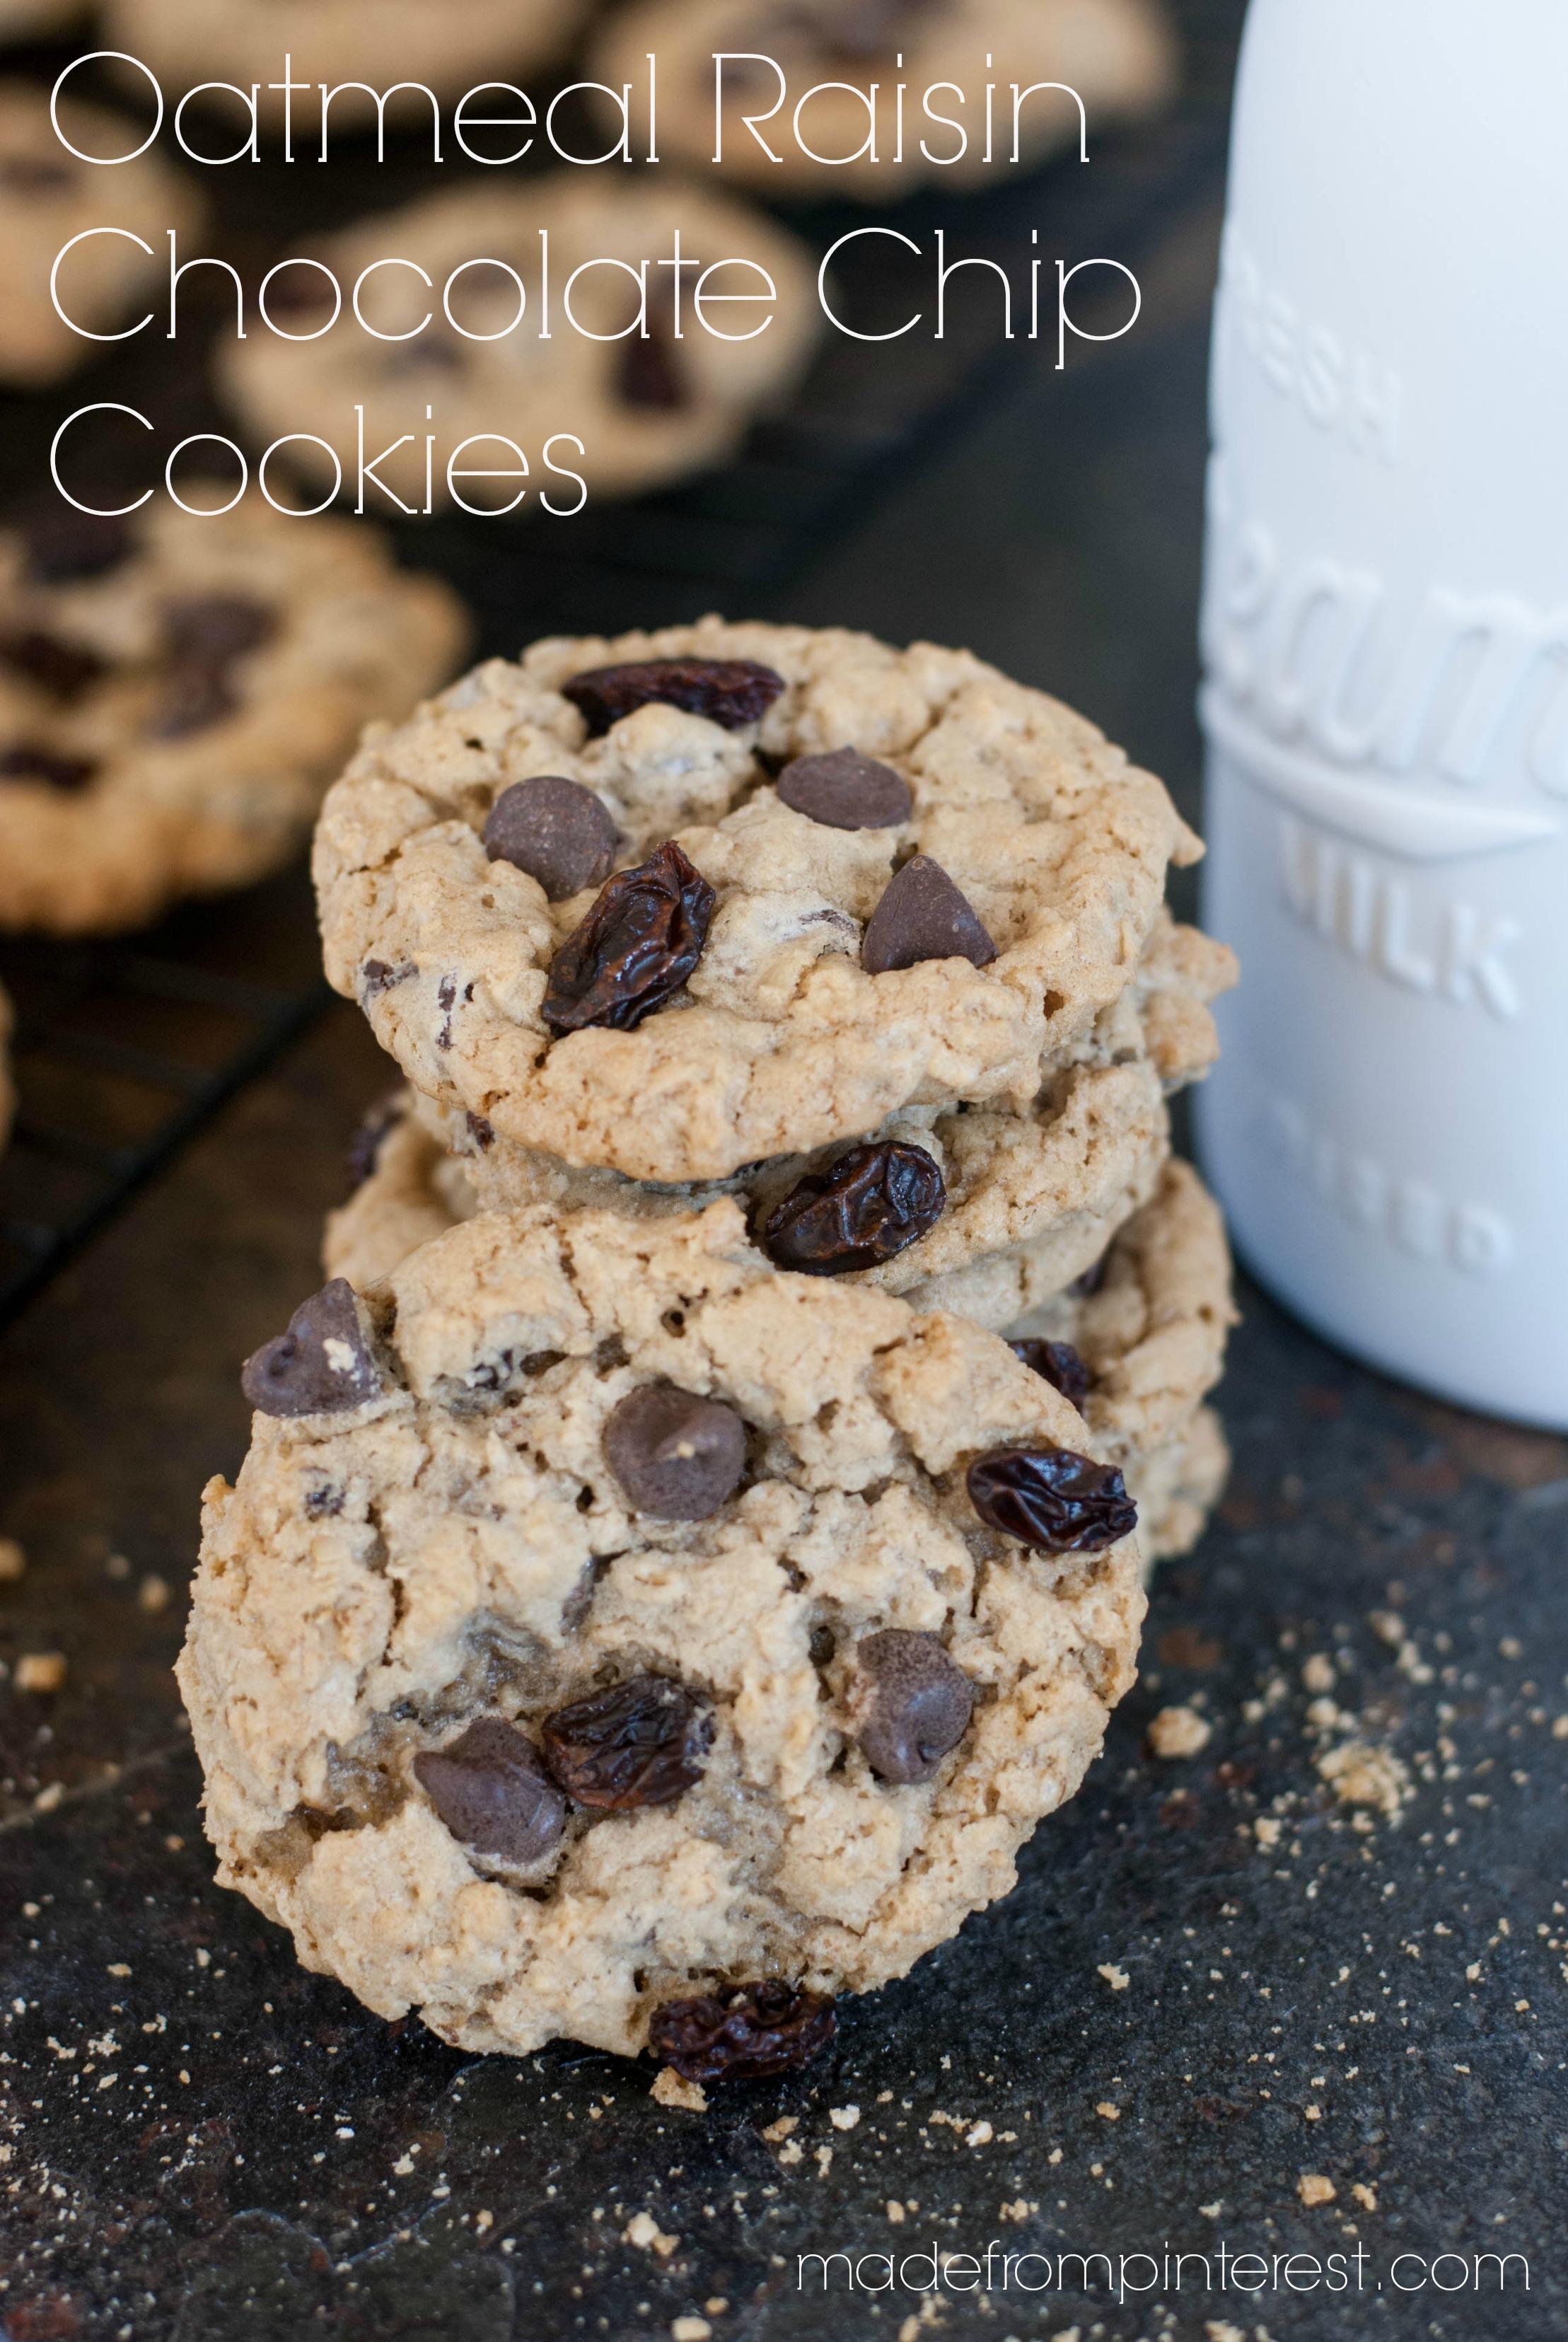 Oatmeal Raisin Chocolate Chip Cookies - TGIF - This ...